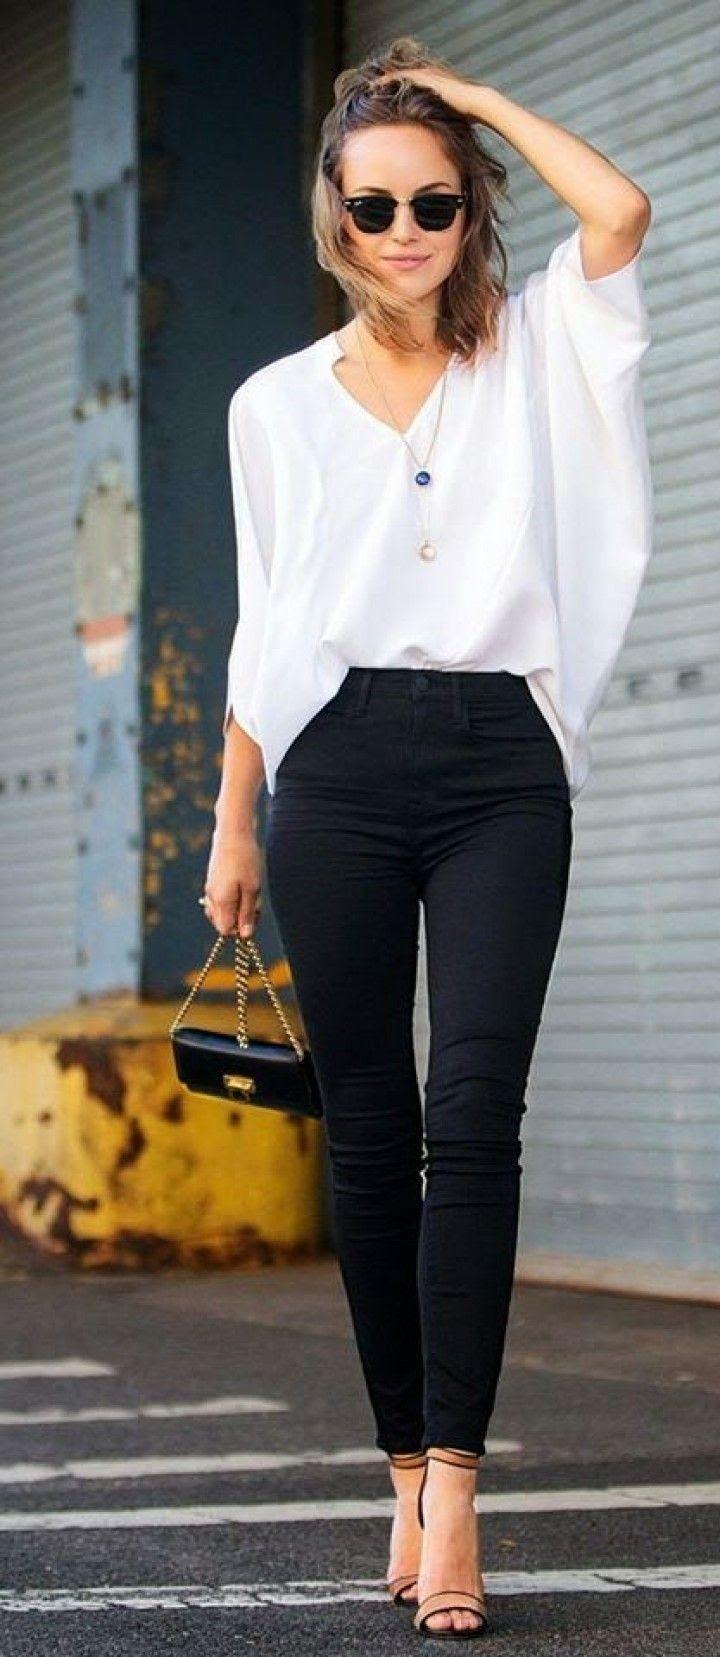 mujer con pantalón negro y blusa blanca  5f37bbd25a0e